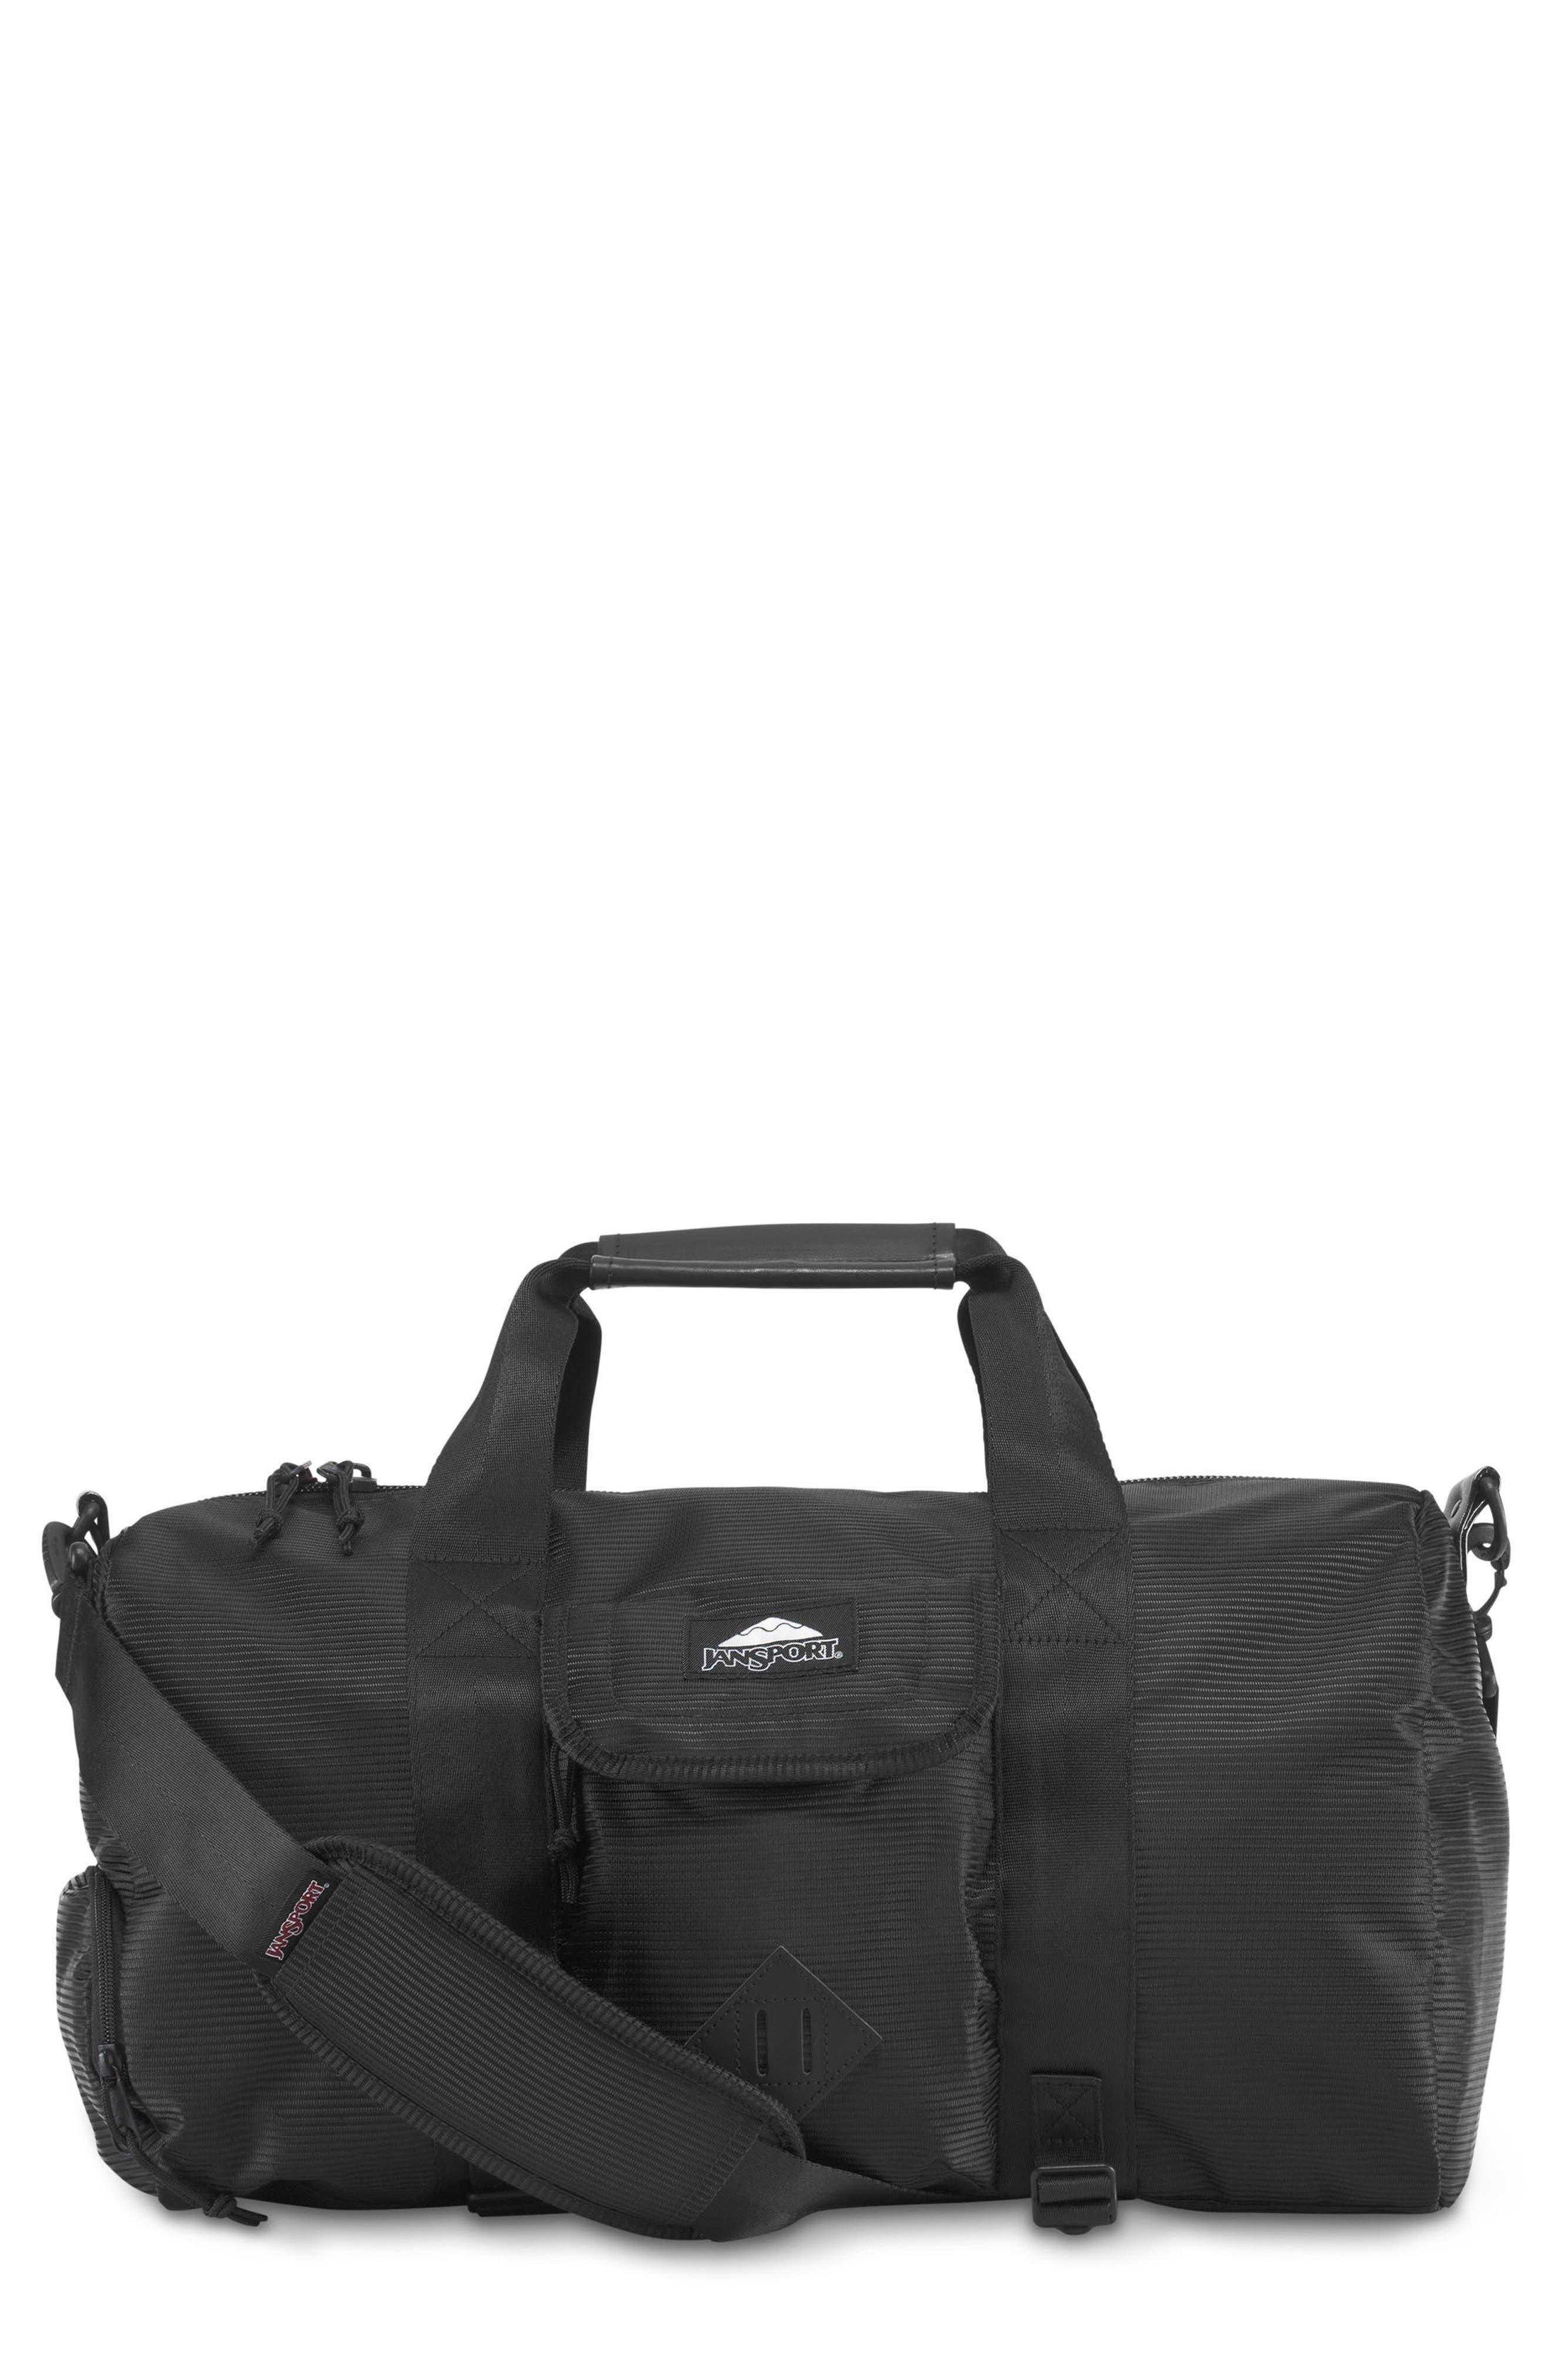 Jansport Duffel Bag